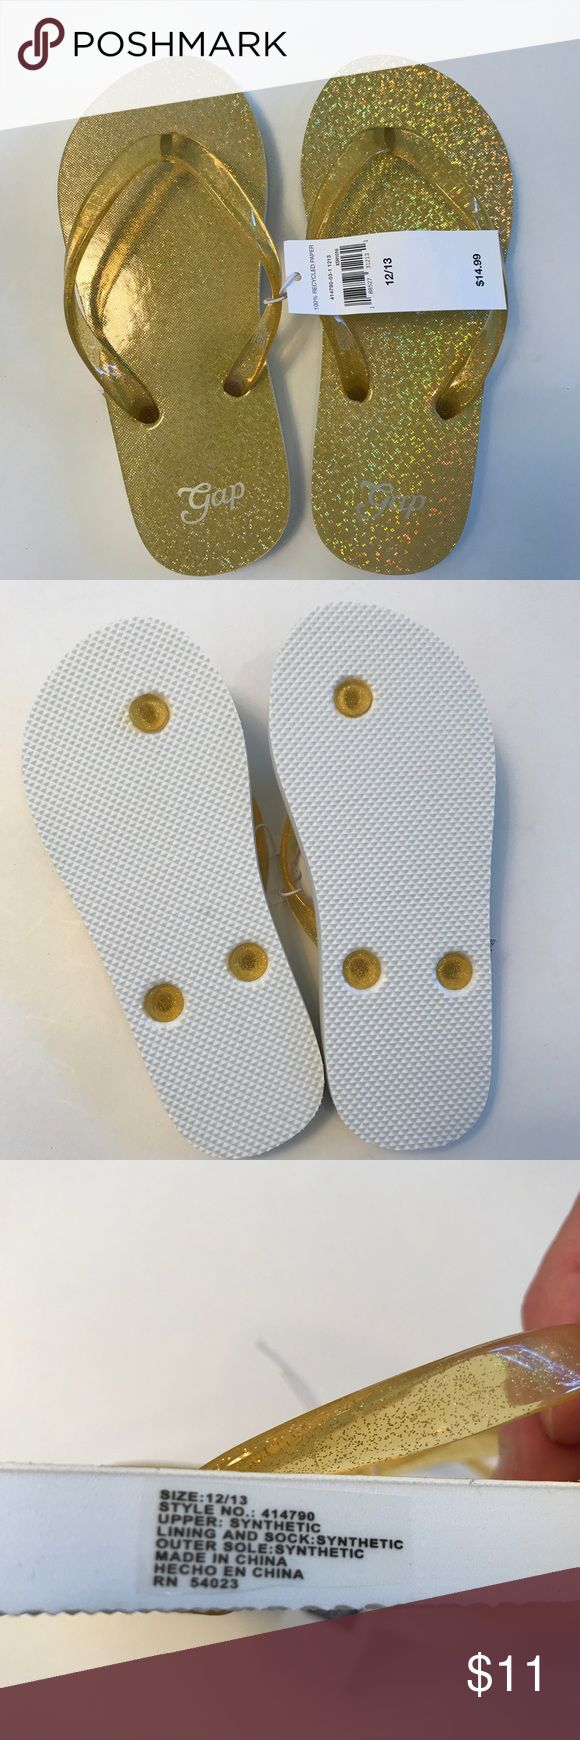 NWT Gap Gold/yellow flip-flops NWT Gap gold/yellow flip-flops. Size 12/13. Gap Shoes Sandals & Flip Flops